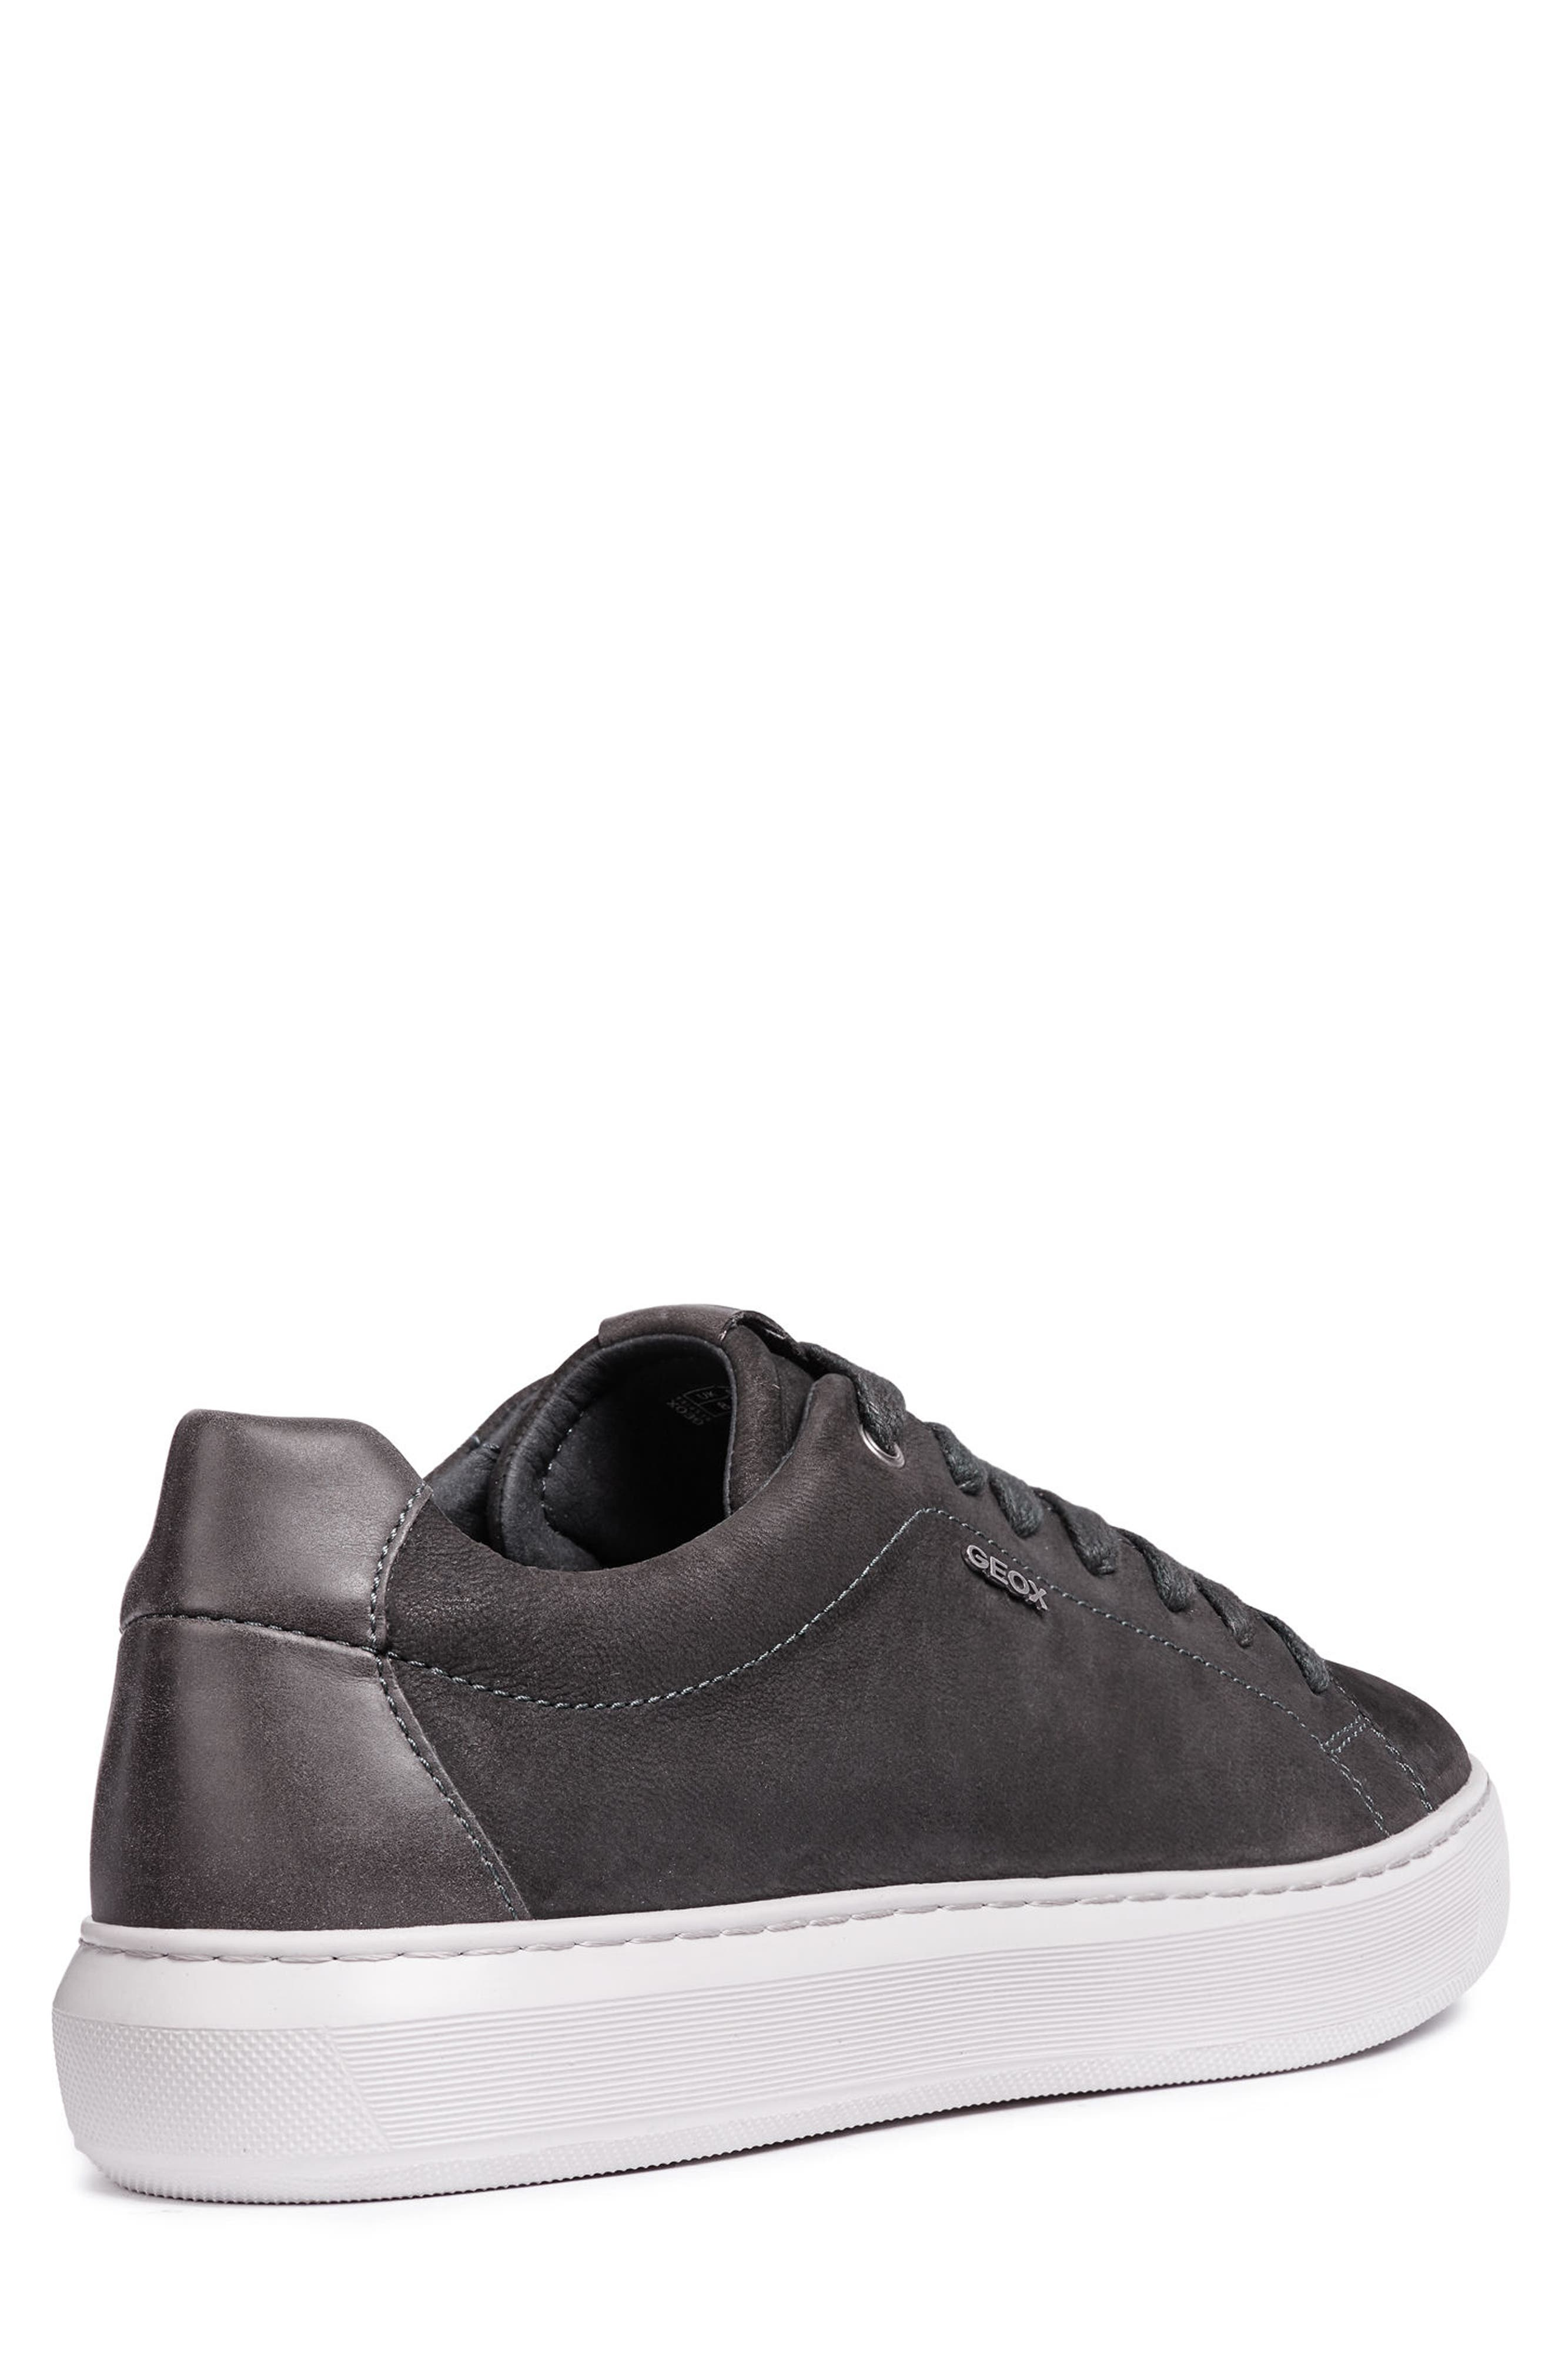 Deiven 5 Low Top Sneaker,                             Alternate thumbnail 2, color,                             DARK JEANS LEATHER